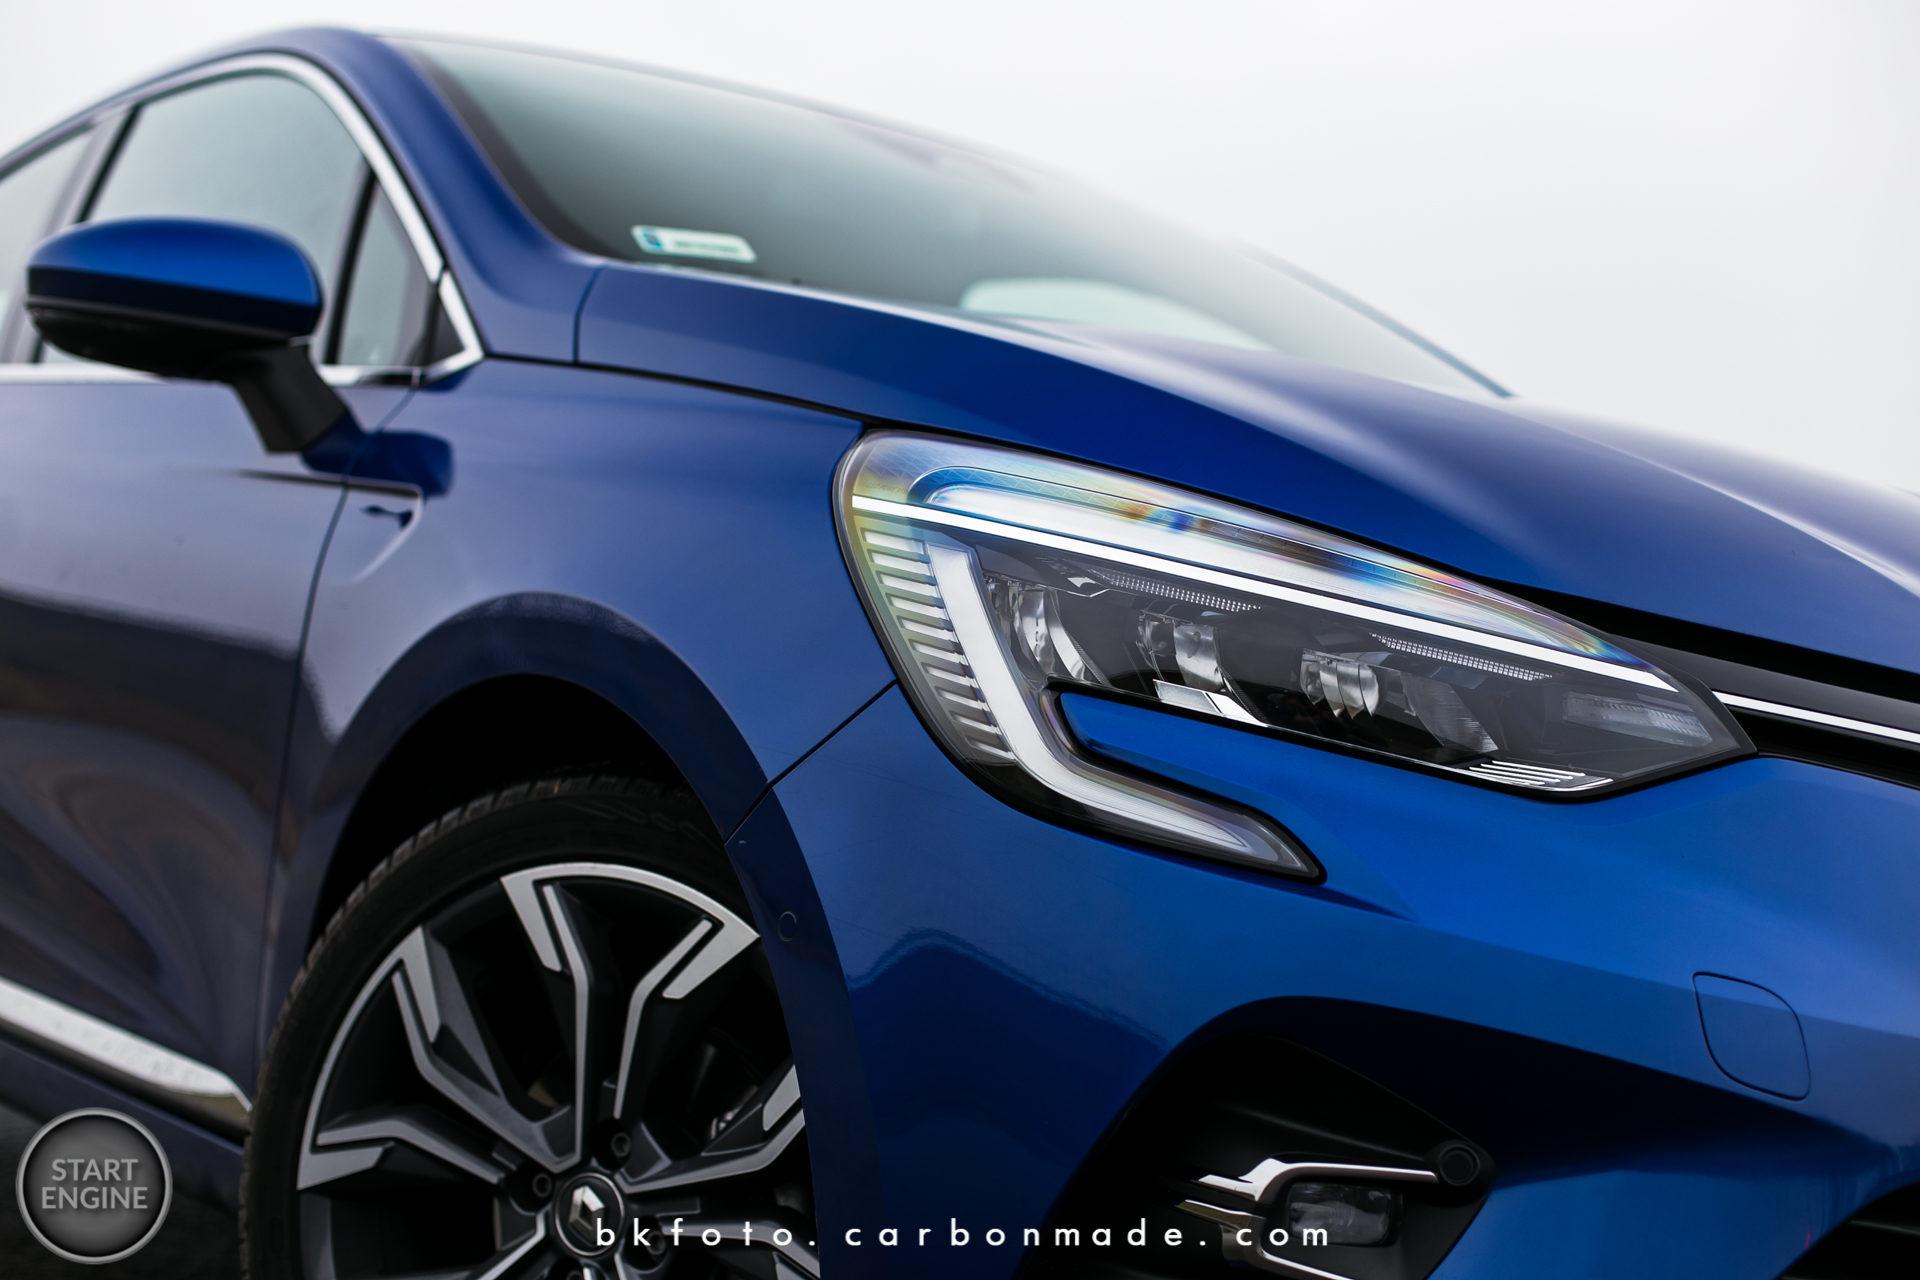 Renault Clio Intens 1.0 TCe 100 KM 5MT